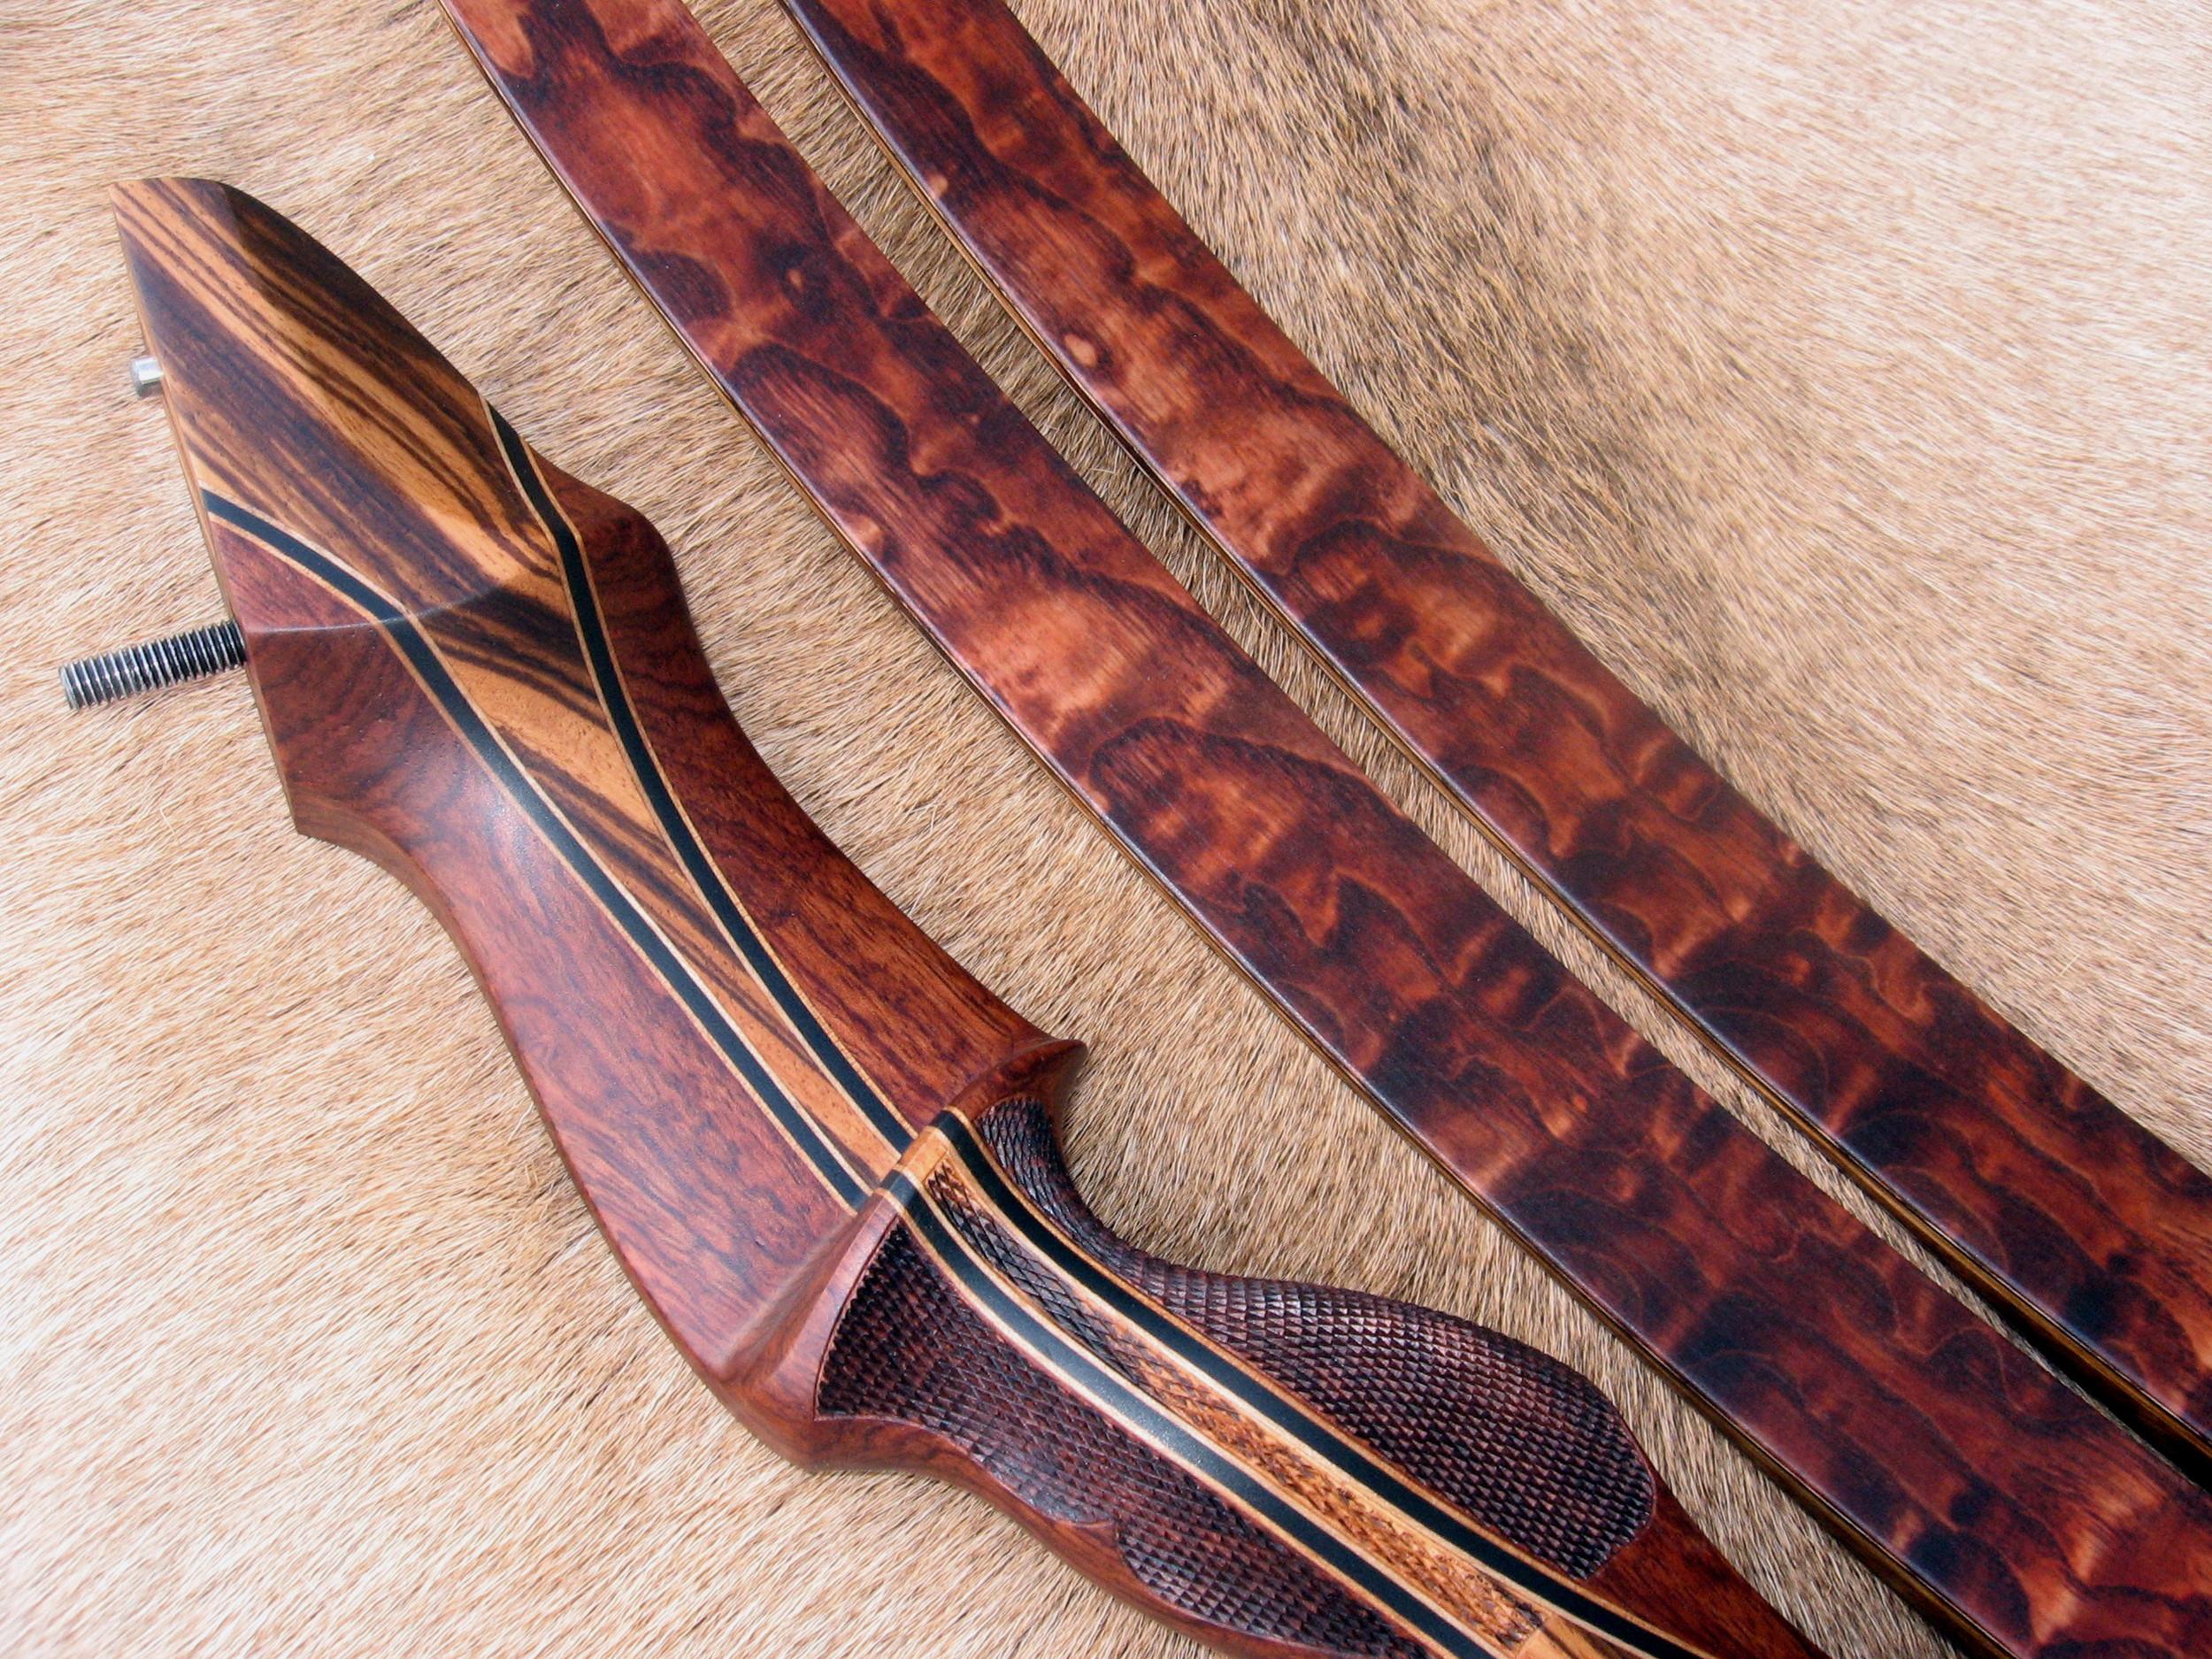 Bubinga Riser w/ Zebrawood Flare- Tamo Ash limbs stained Cocobolo